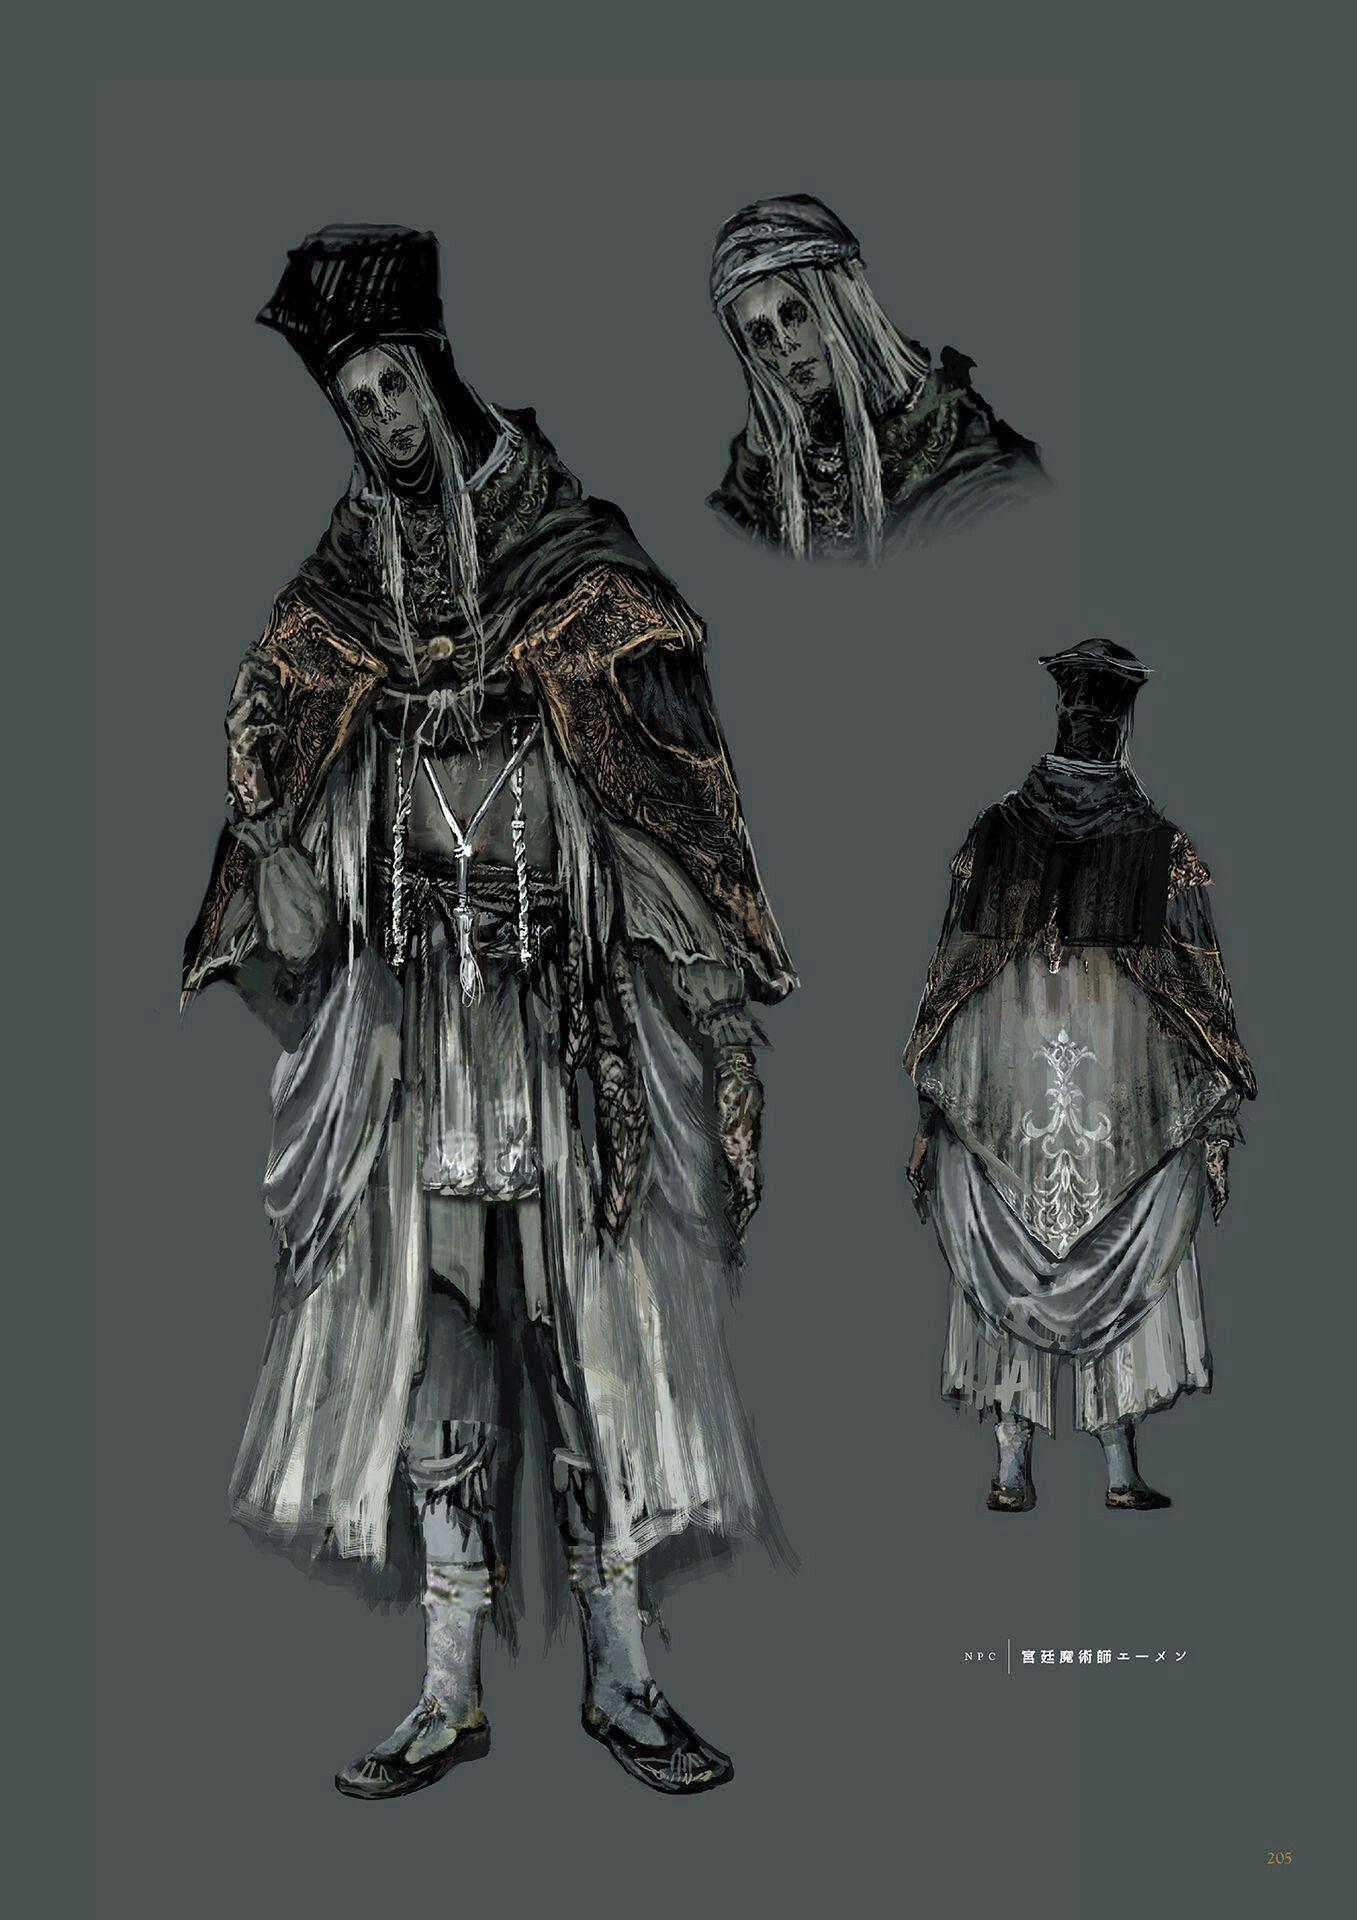 Dark Souls 3 Concept Art - Npc Videogame